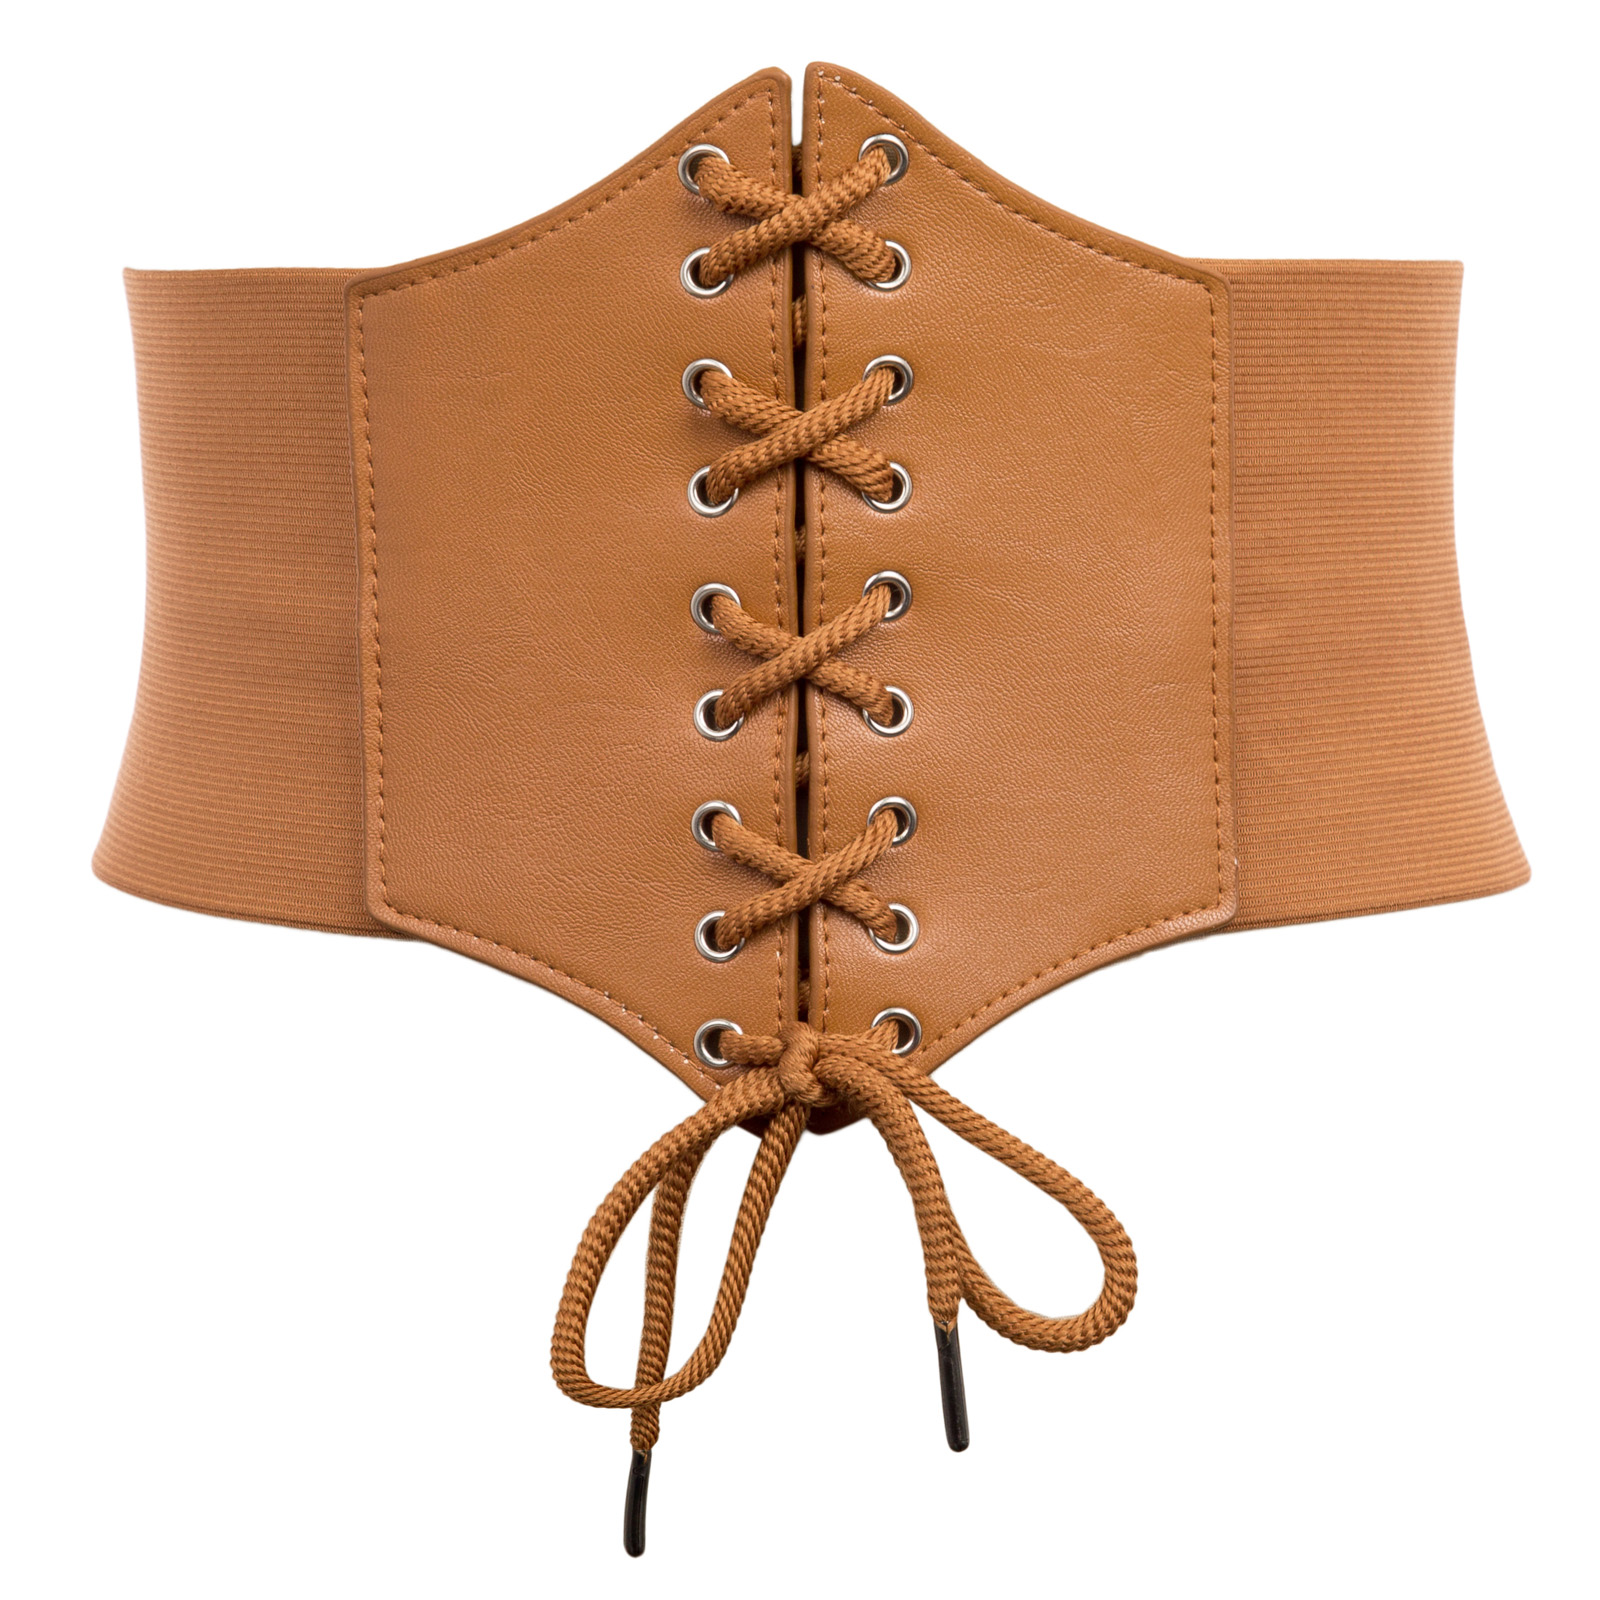 Plus Size 3XL Corset   Belt   For Womens 2018 Fashion Lace Up PU Leather Luxury   Belt   Cinch Tie Corset Waist Wide   Belt   Waistband